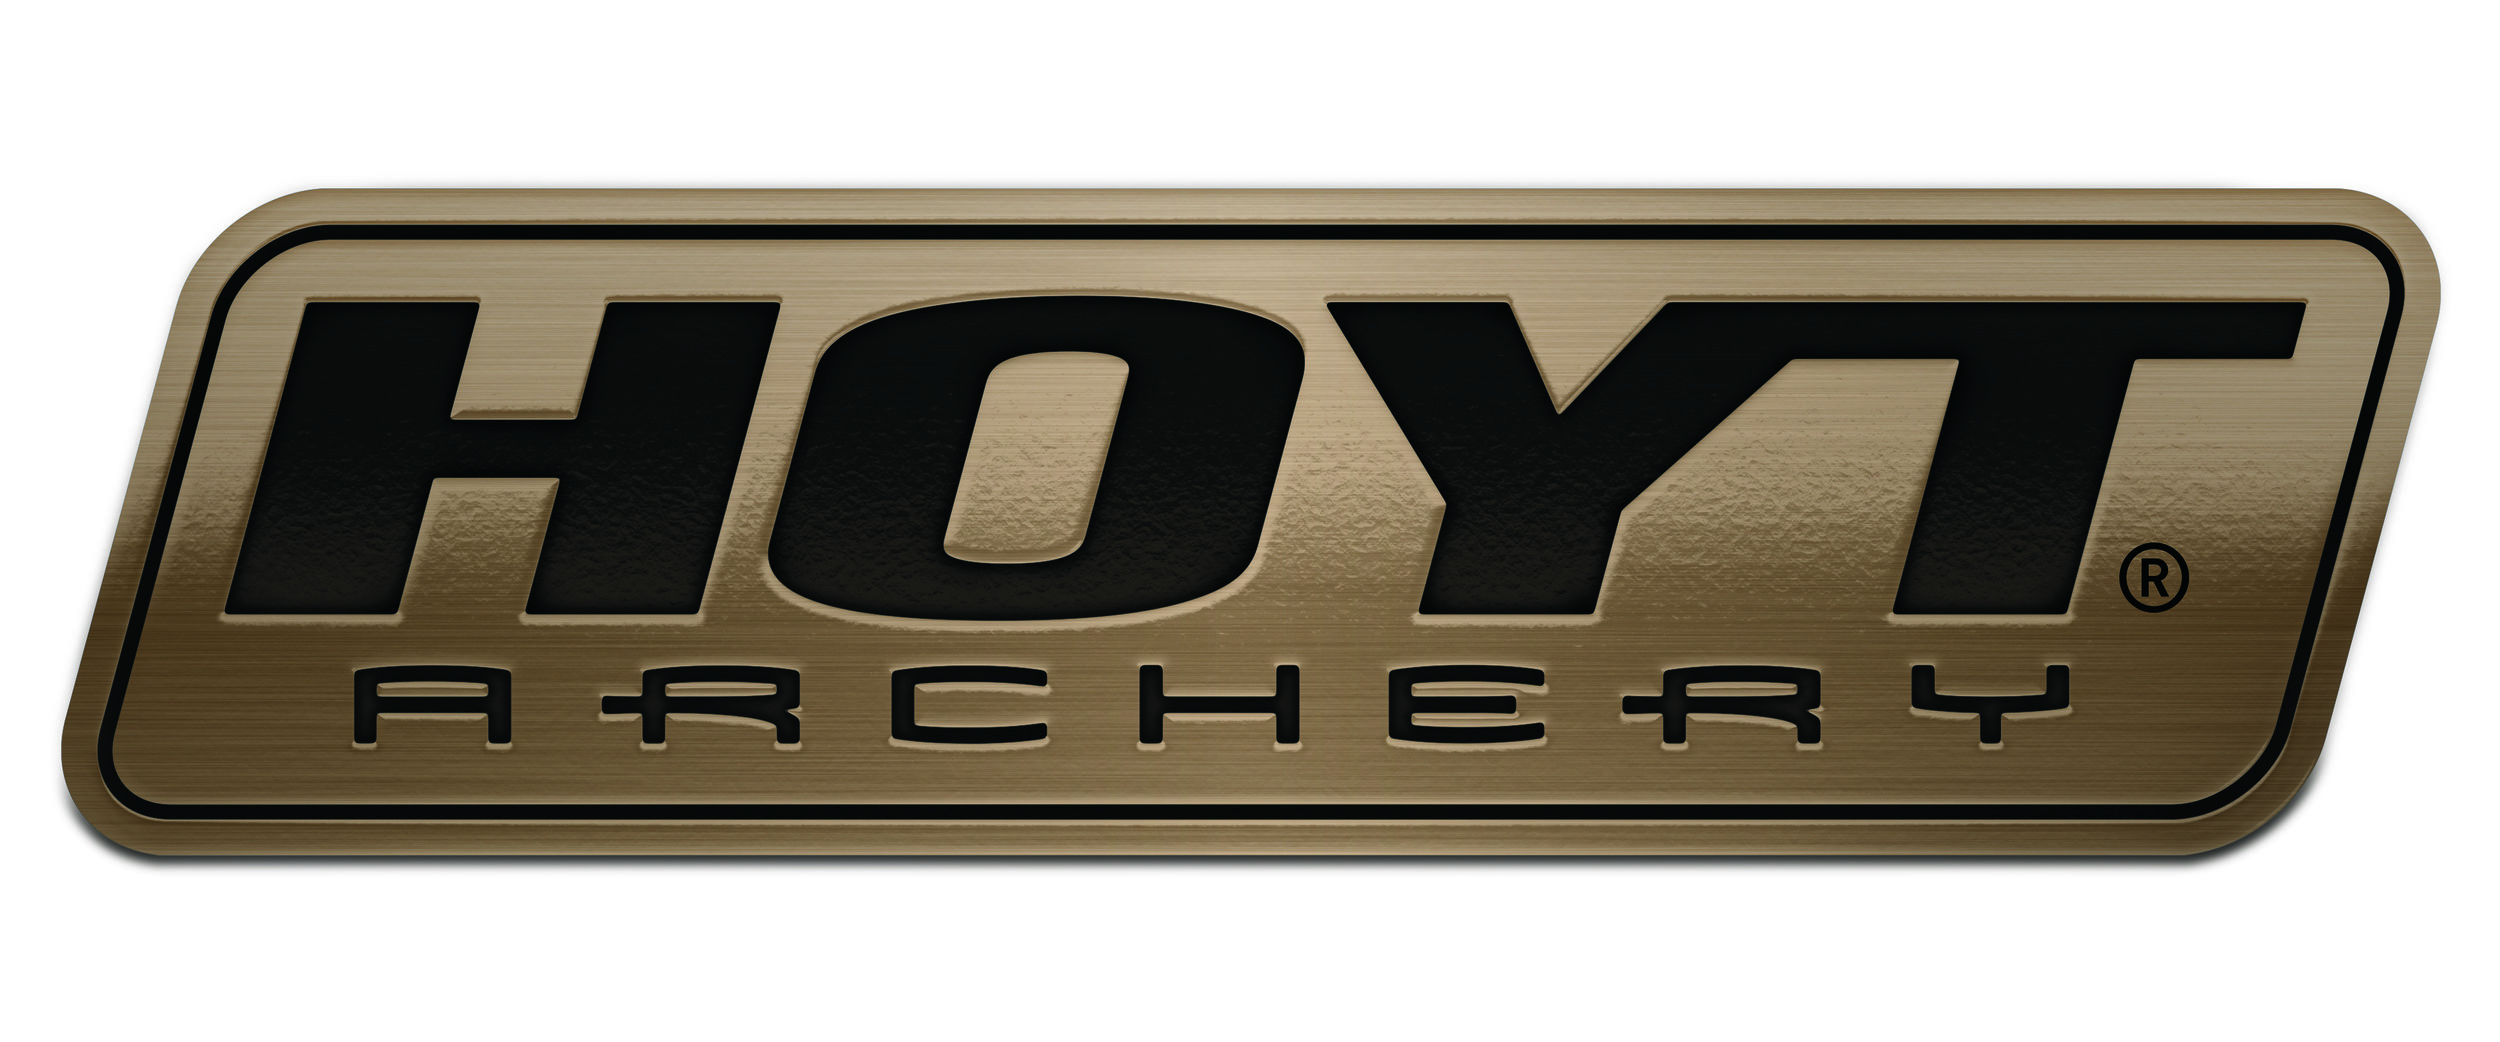 Hoyt Archery bronze logo.jpg